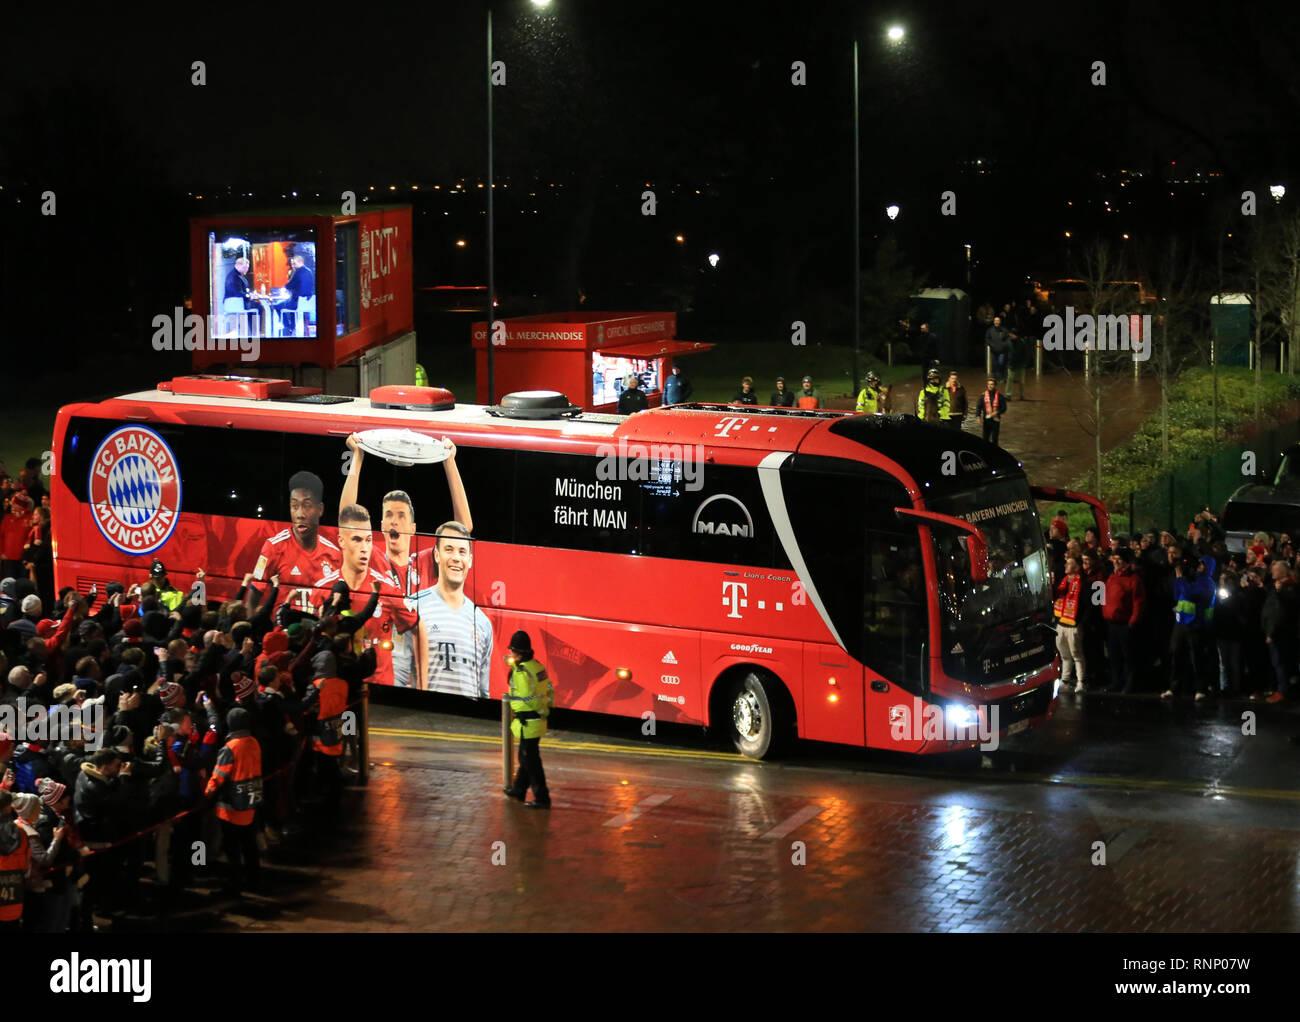 Anfield, Liverpool, UK  19th Feb, 2019  UEFA Champions